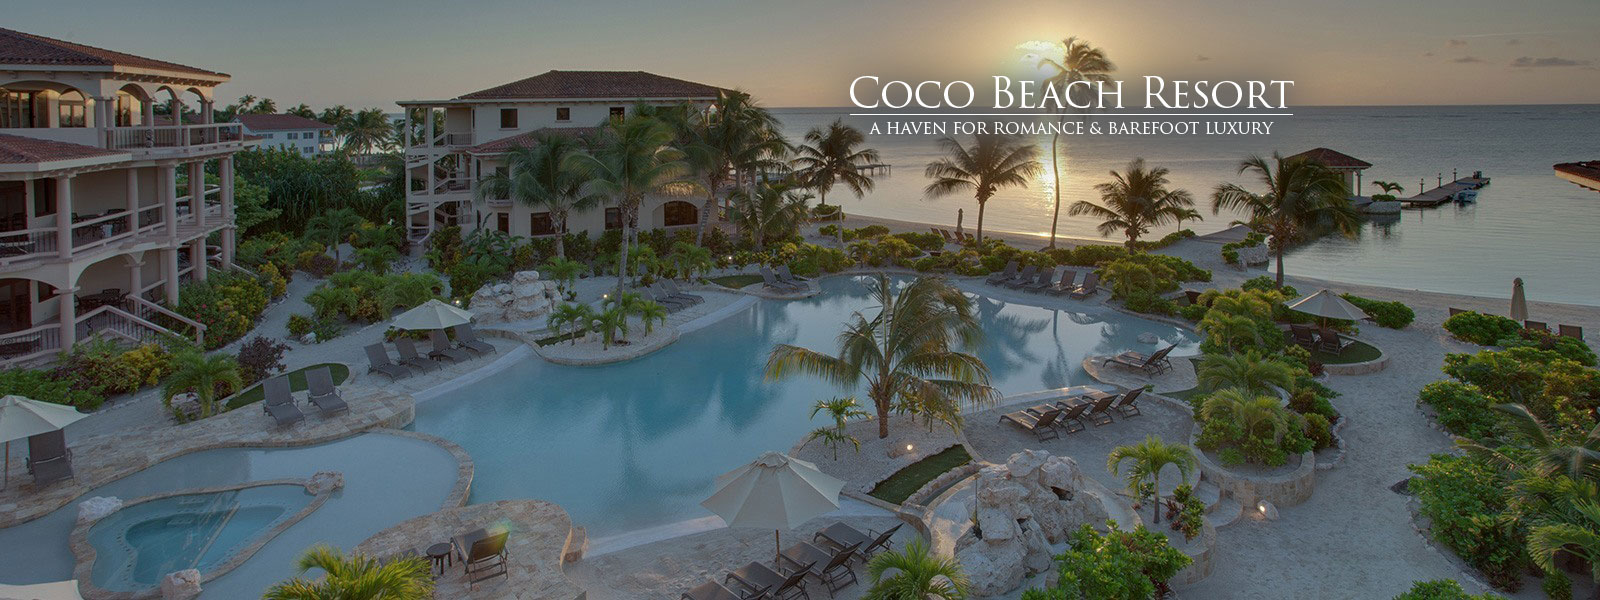 Coco Beach Resort, Ambergris Caye, Belize